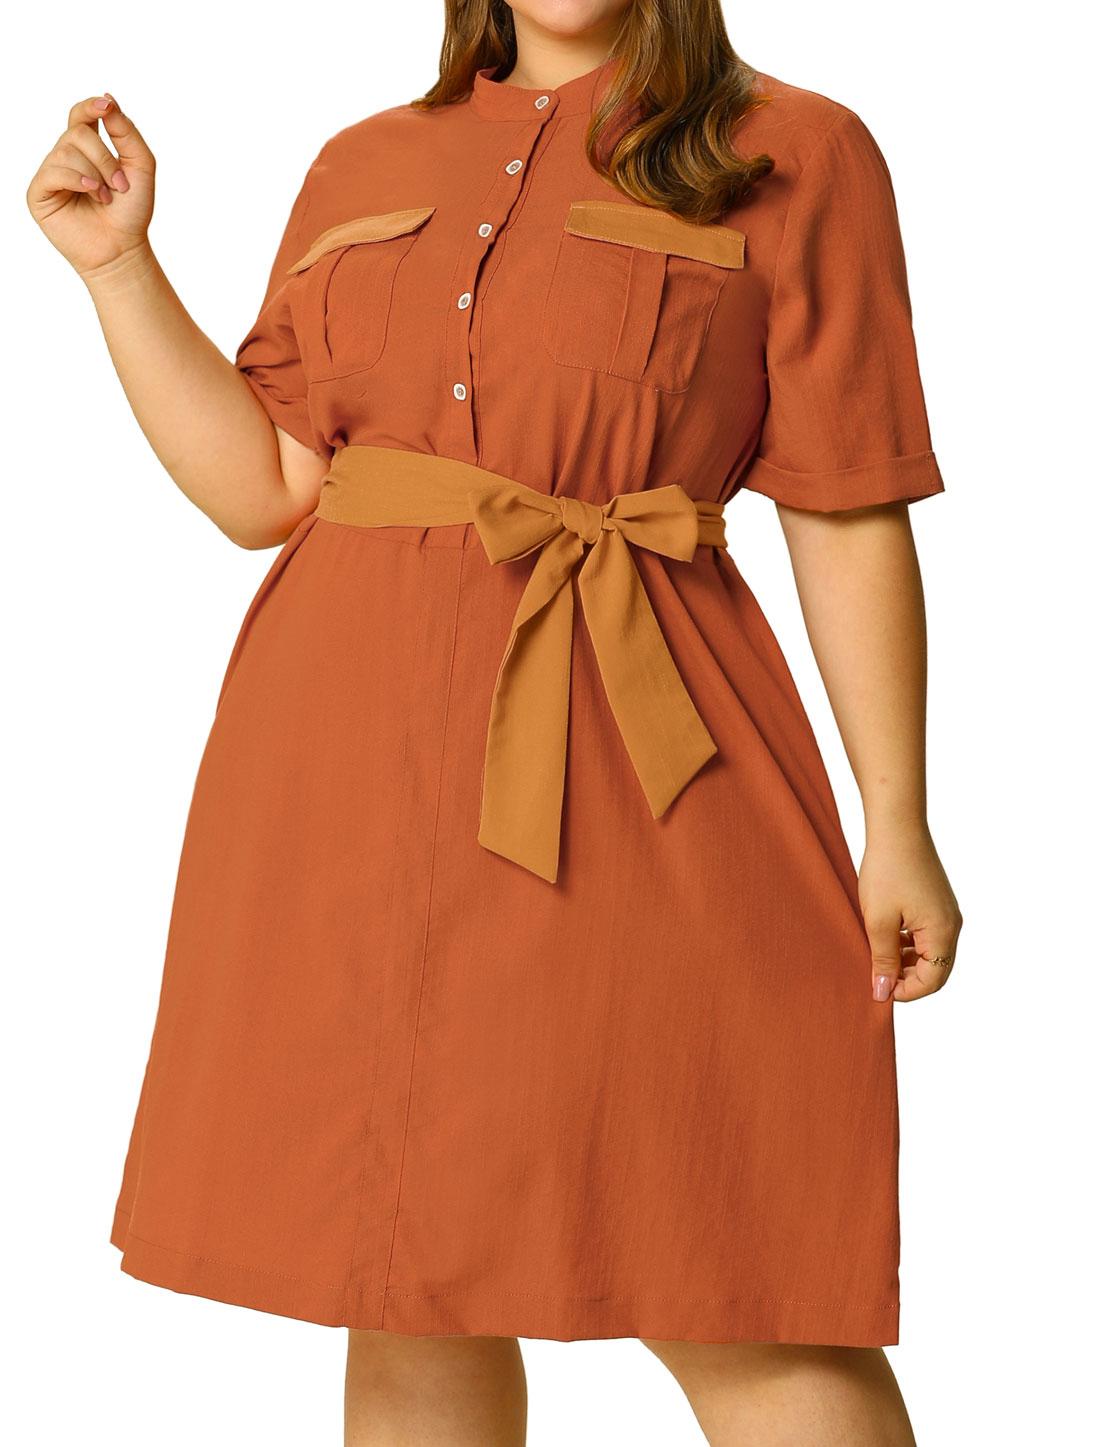 Women's Plus Size Tie Waist Belt Button Down Casual Midi Shirt Dress Orange 4X